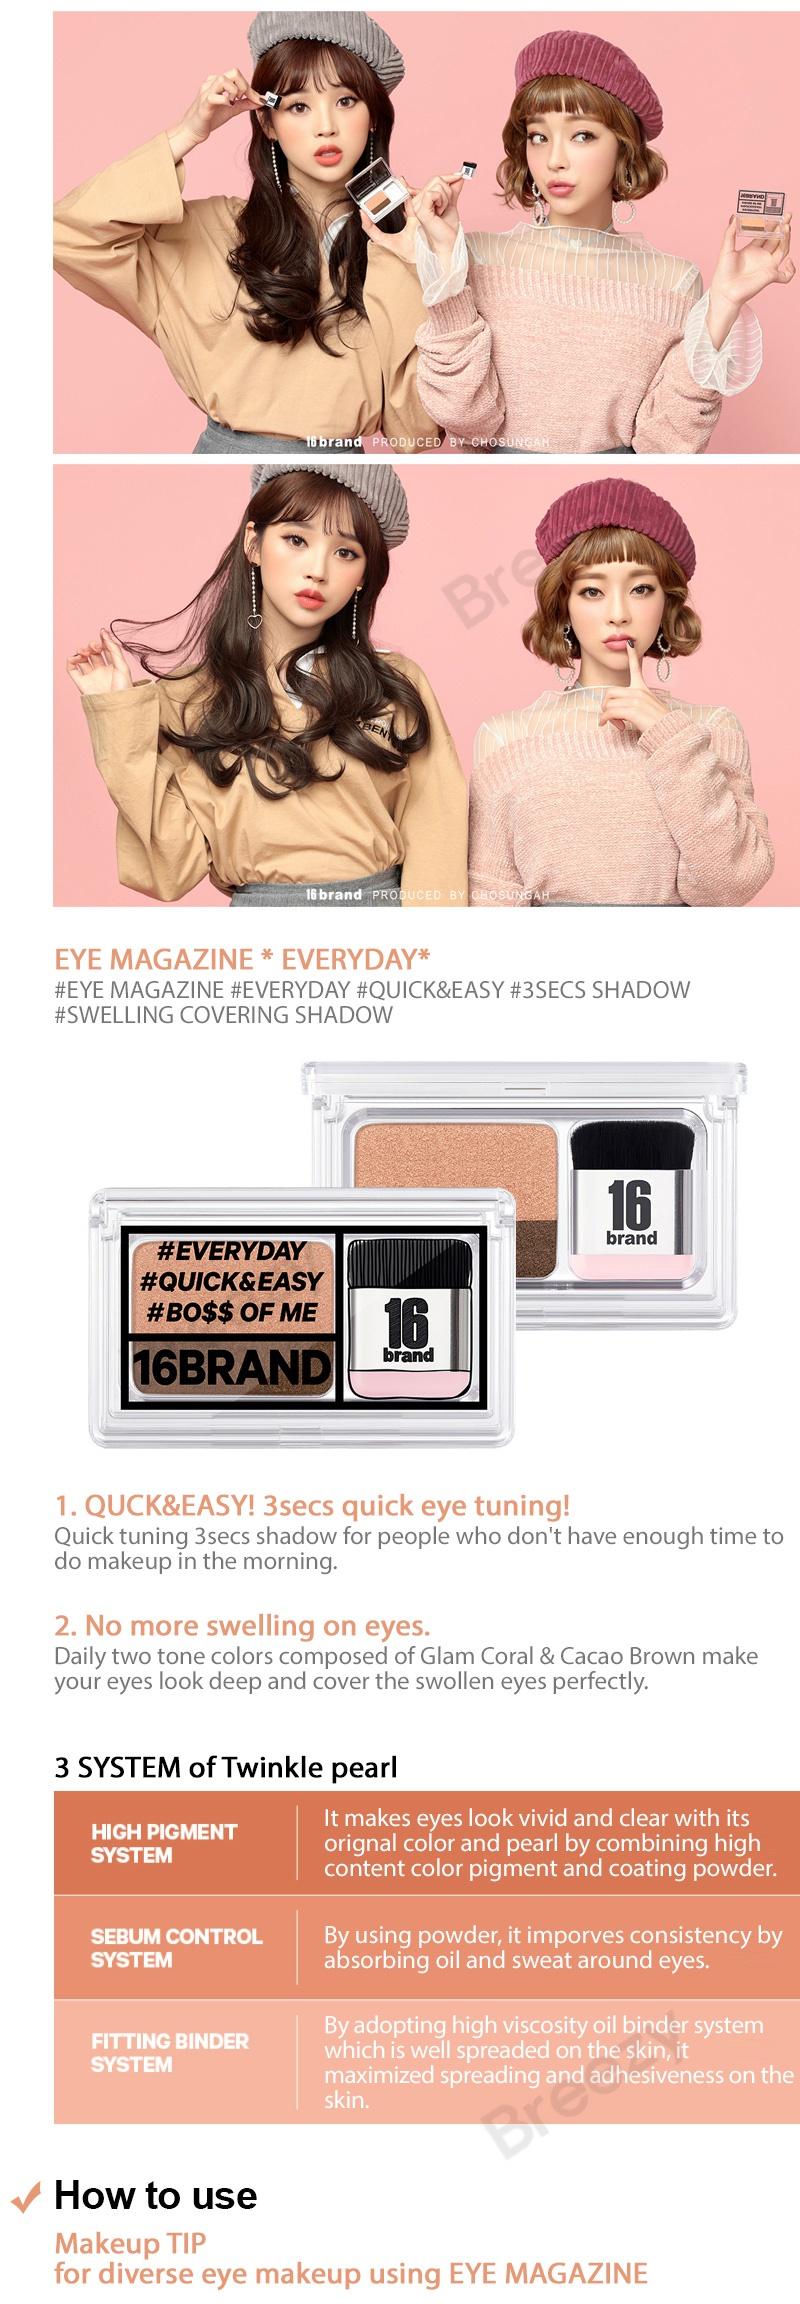 Buy Breezy Apply 10shop Coupon 16 Brand Eye Magazine Shadow Sixteen Highlights